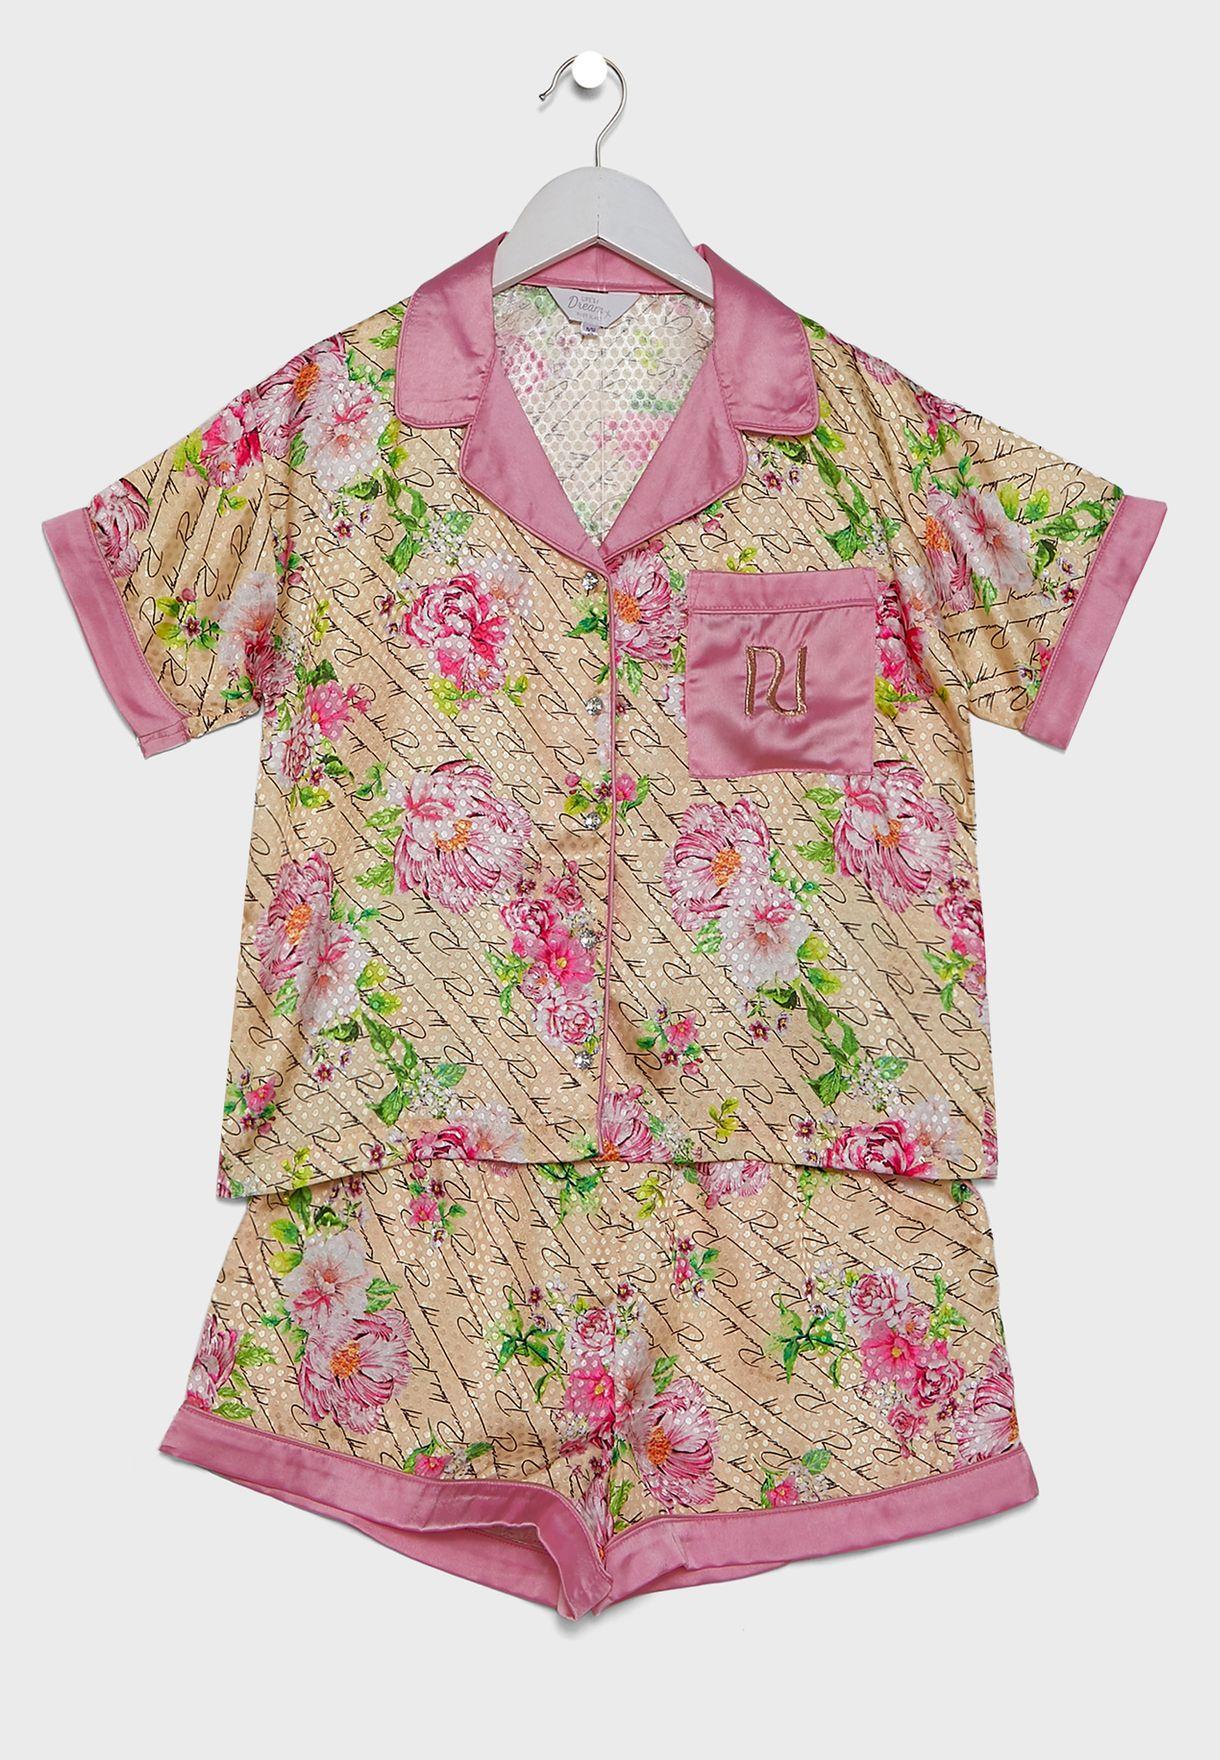 طقم بيجاما (قميص + شورت)